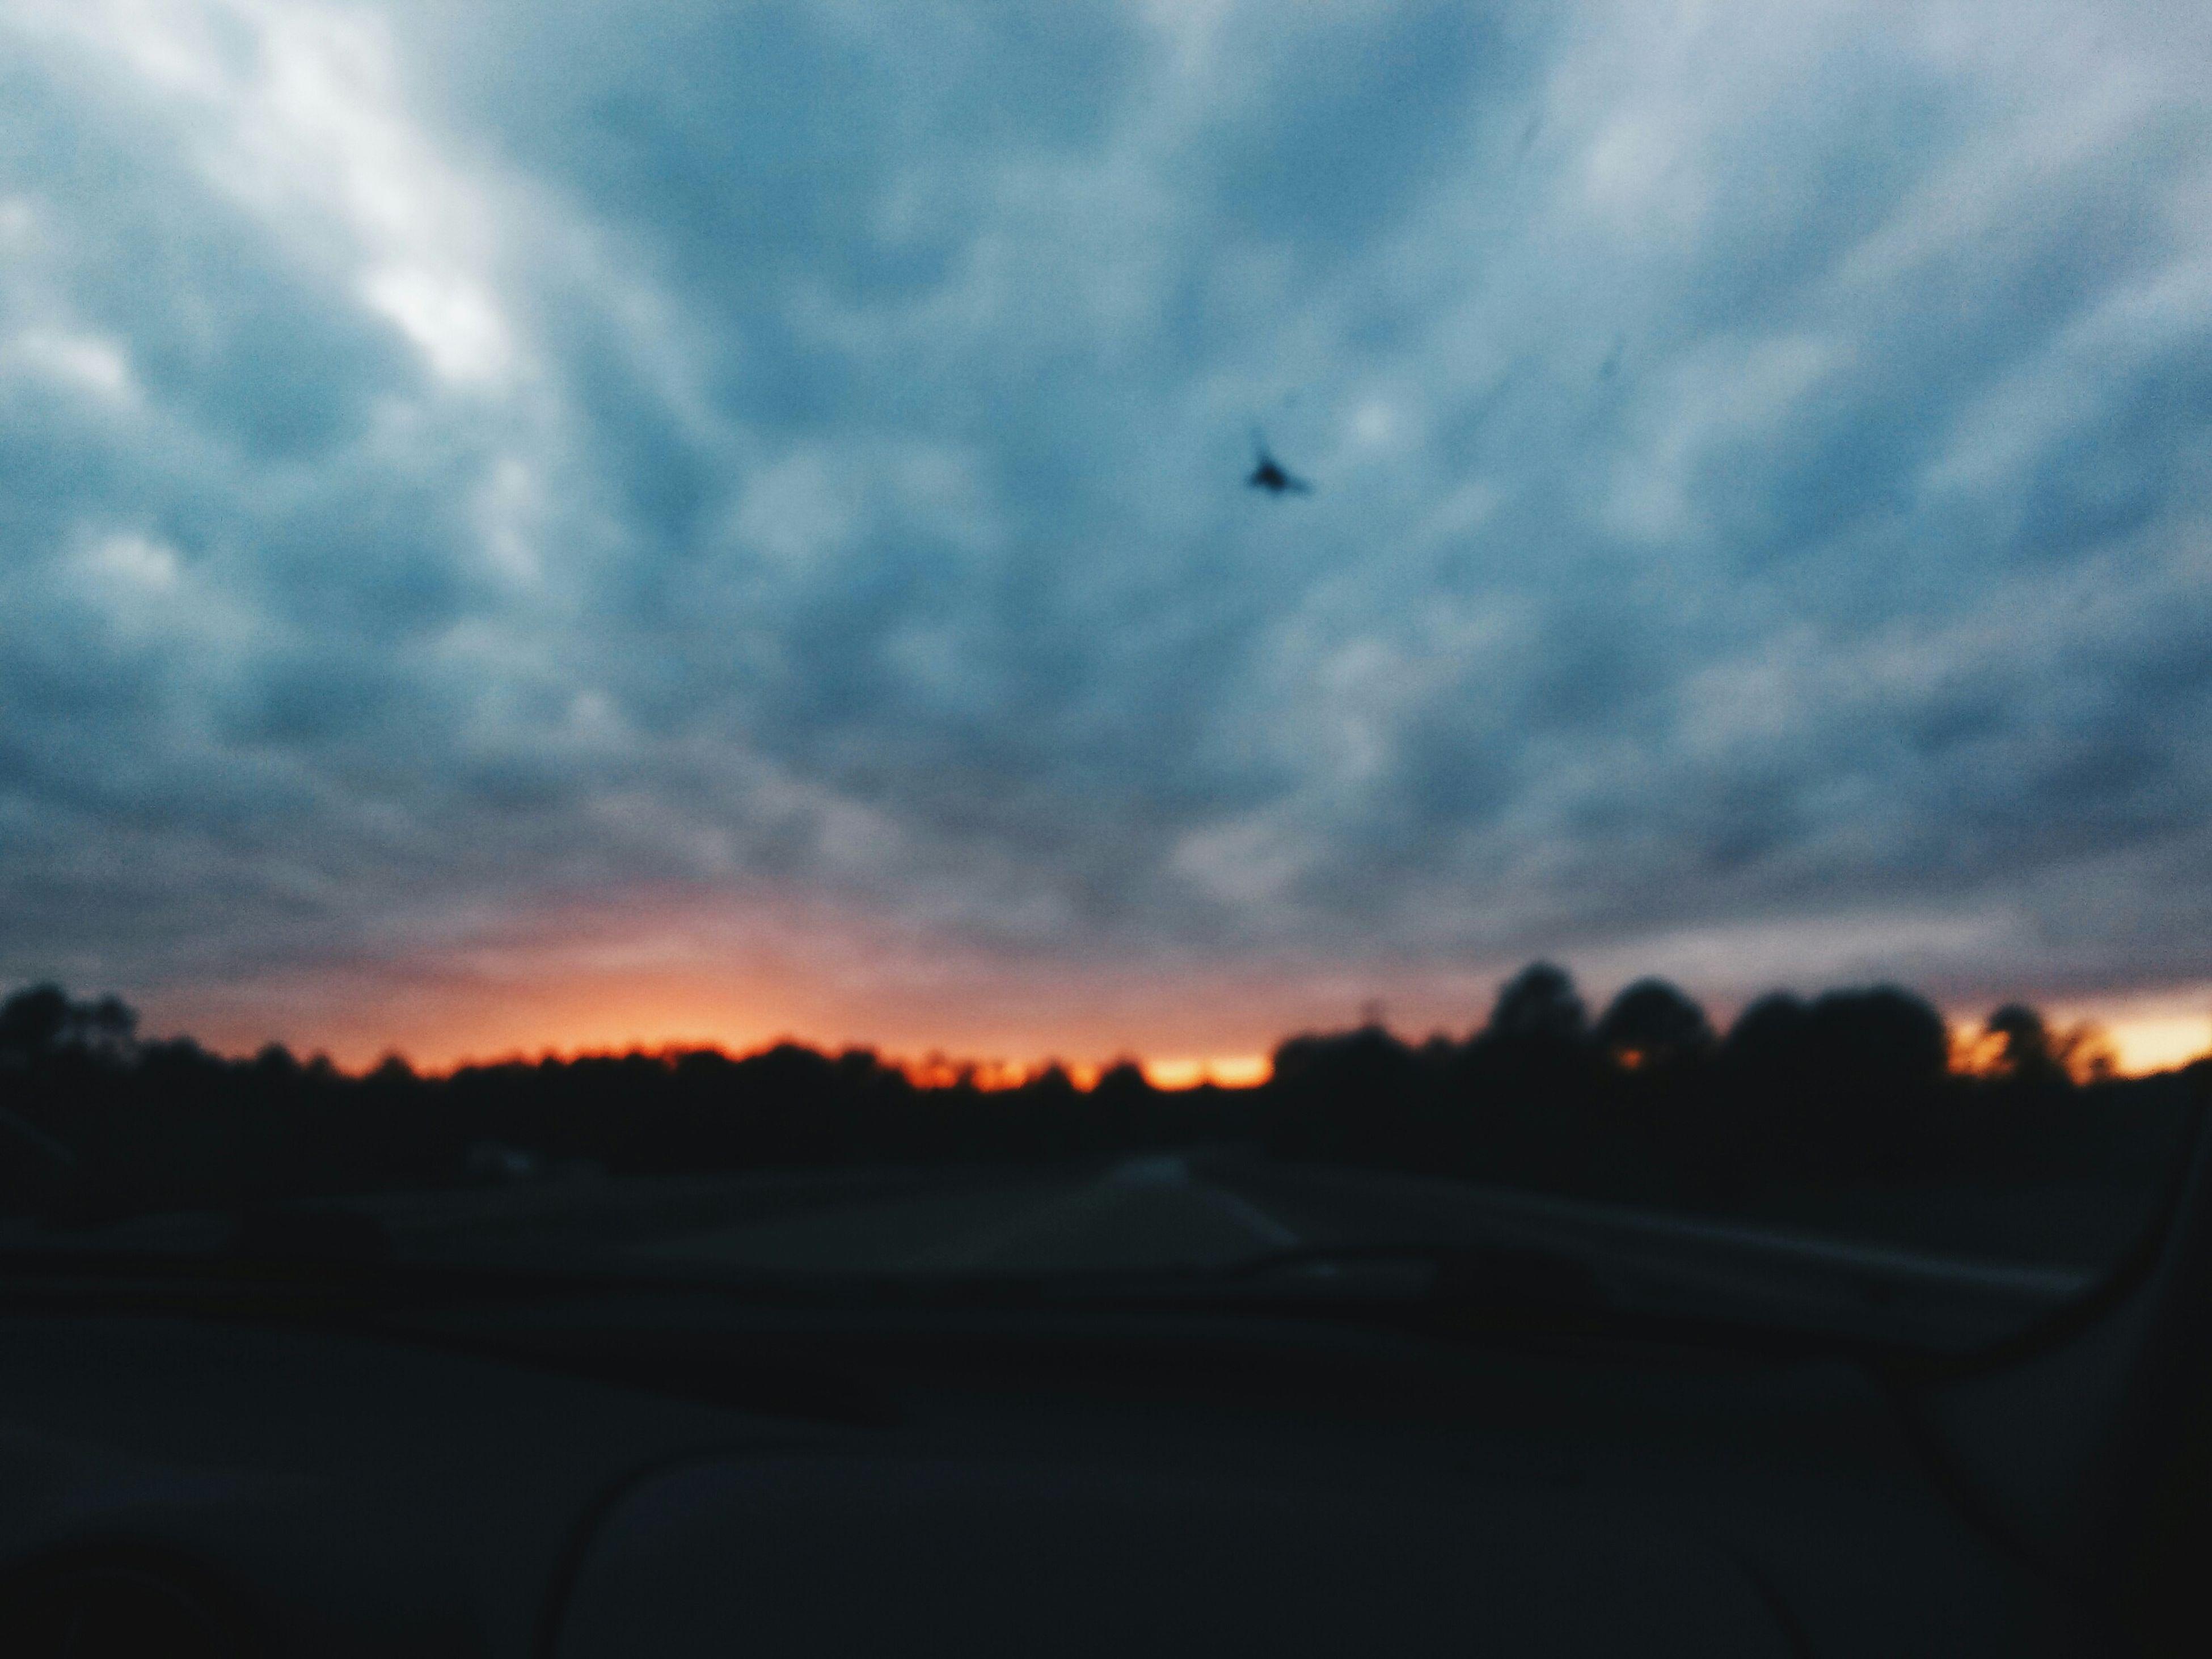 VSCO Cam My Edit Pretty Sunset Orangefield Likefoelike